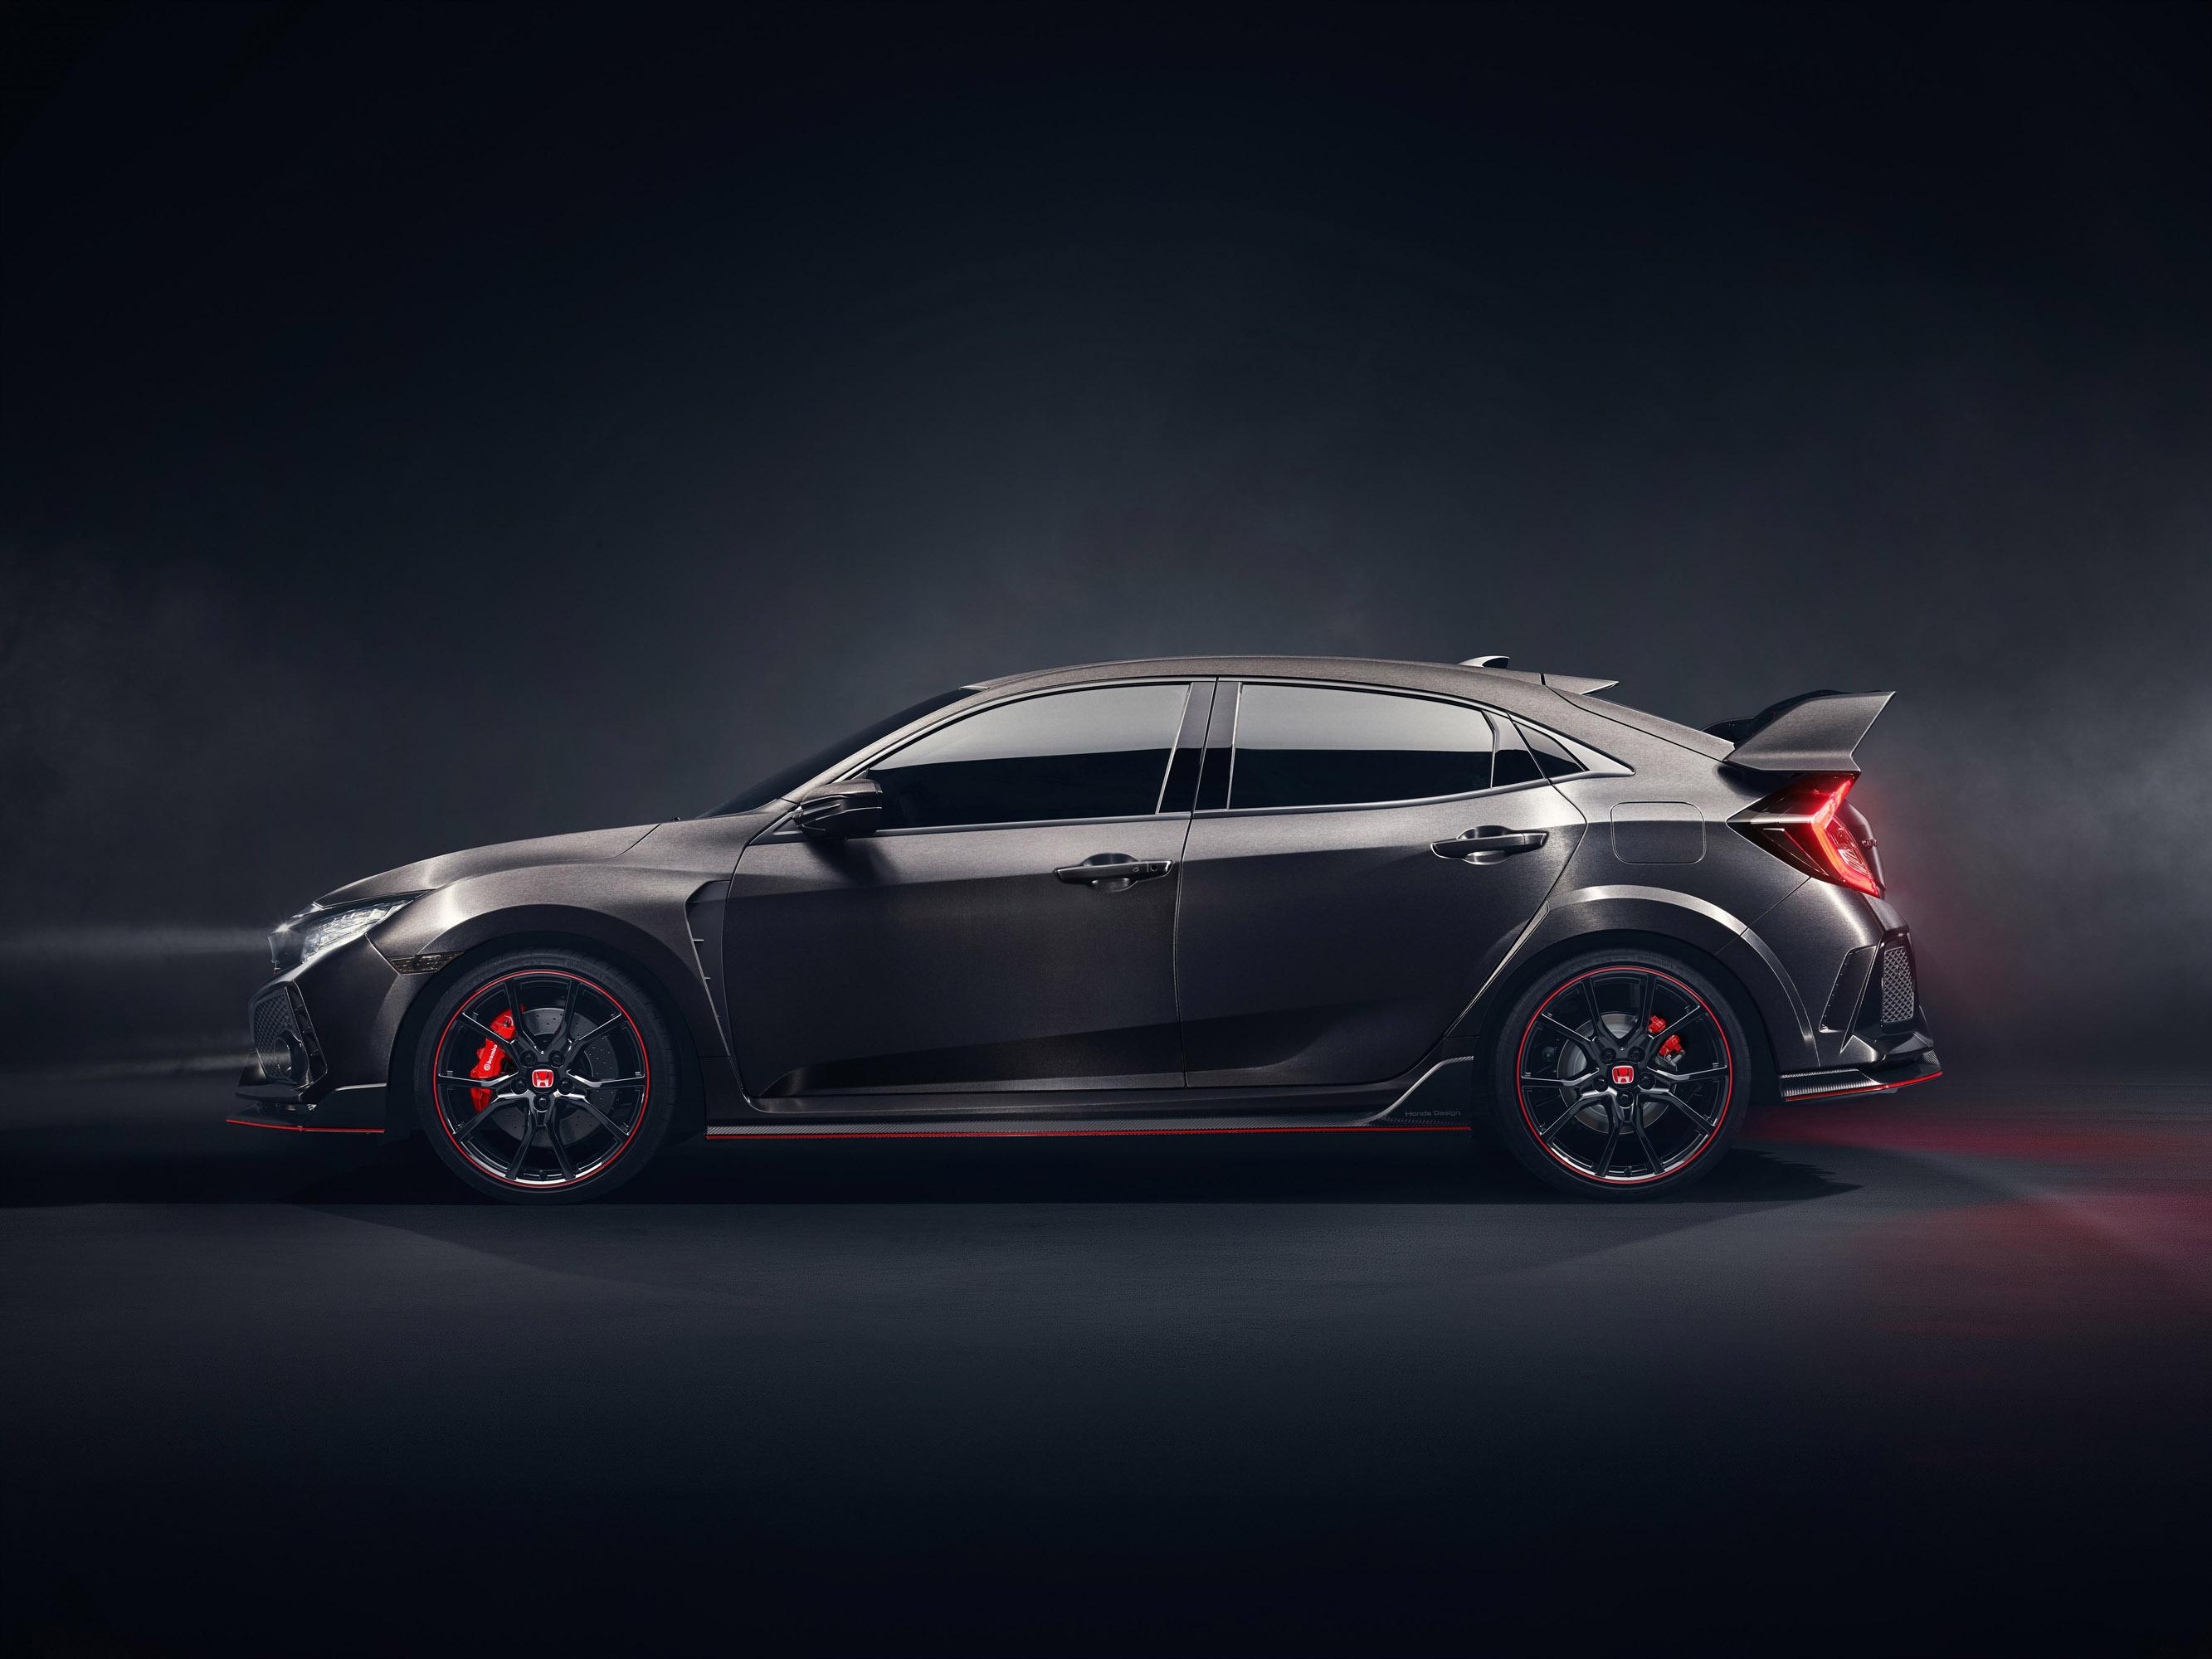 Honda Team Reveals The 2017 Civic Type R